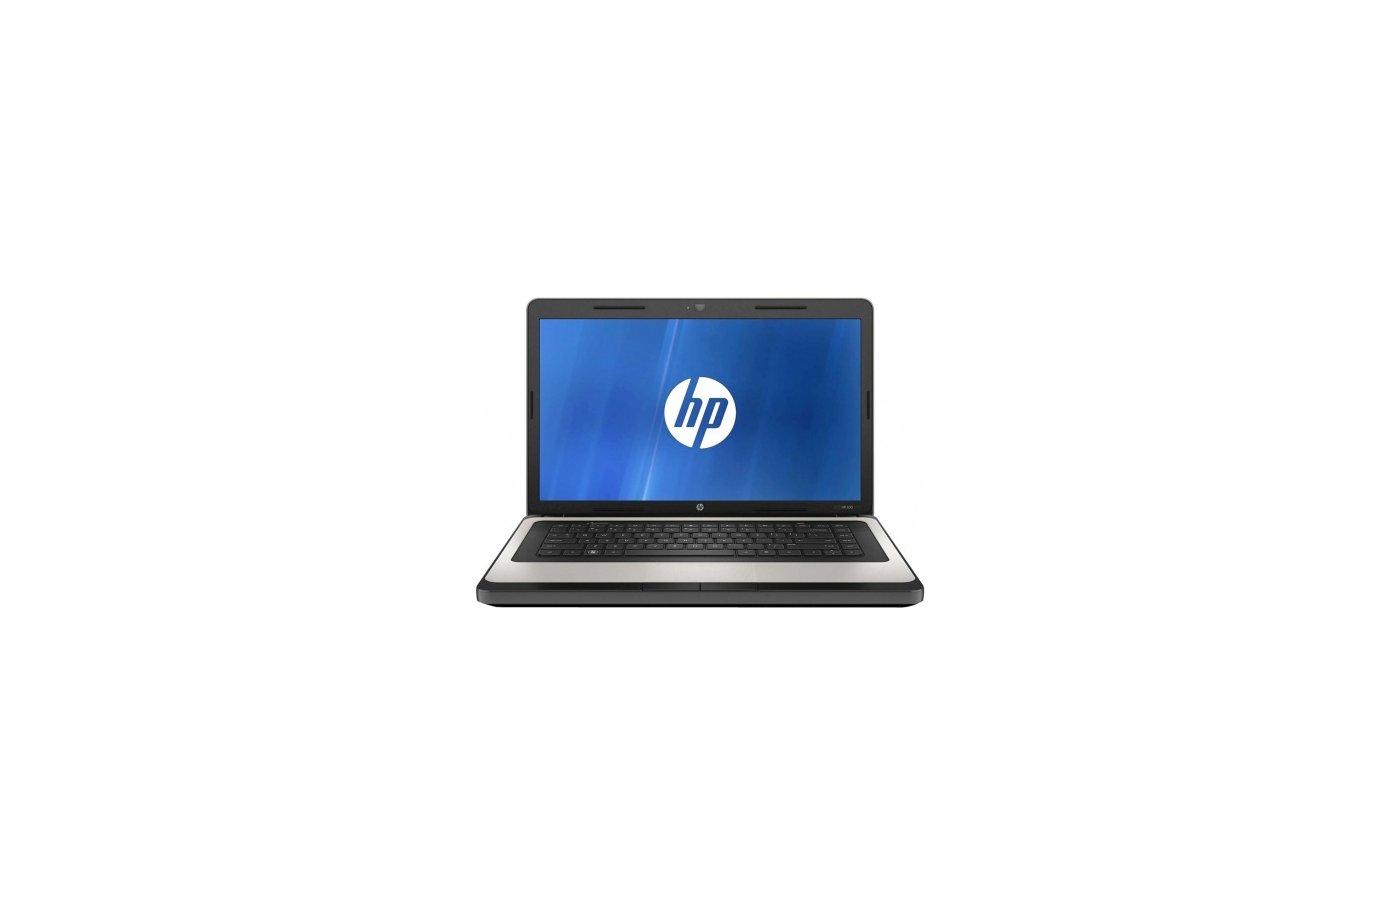 Ноутбук HP 635 /A1E34EA/